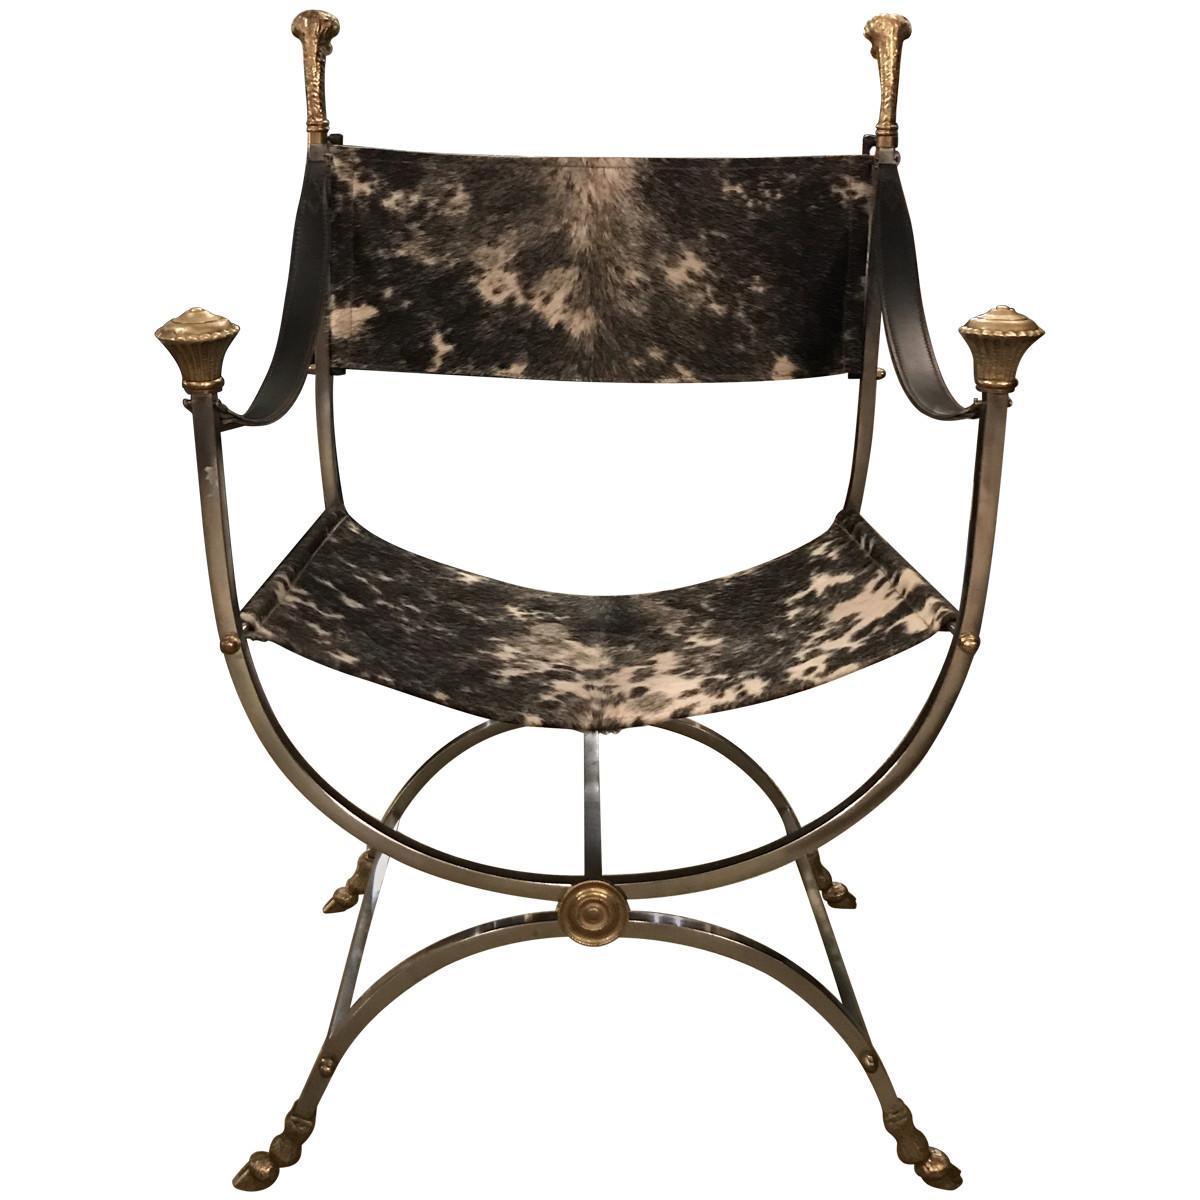 italian maison jansen style steel and cowhide dante chair for sale rh 1stdibs com dante chair italian renaissance dante chairs for sale in blackpool